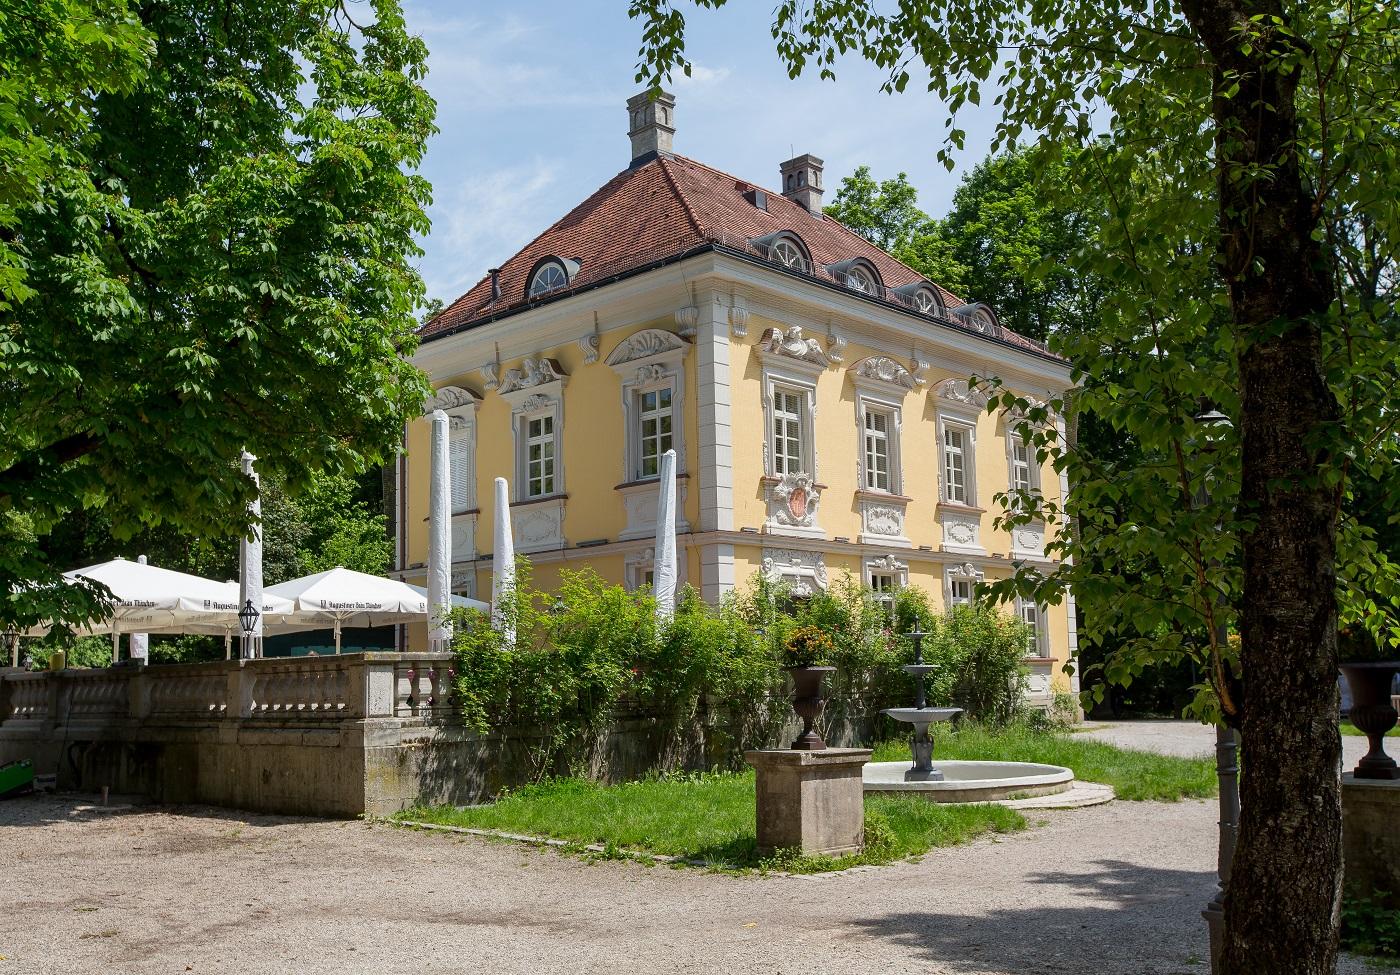 Bamberger Haus Wedding locations fiylo